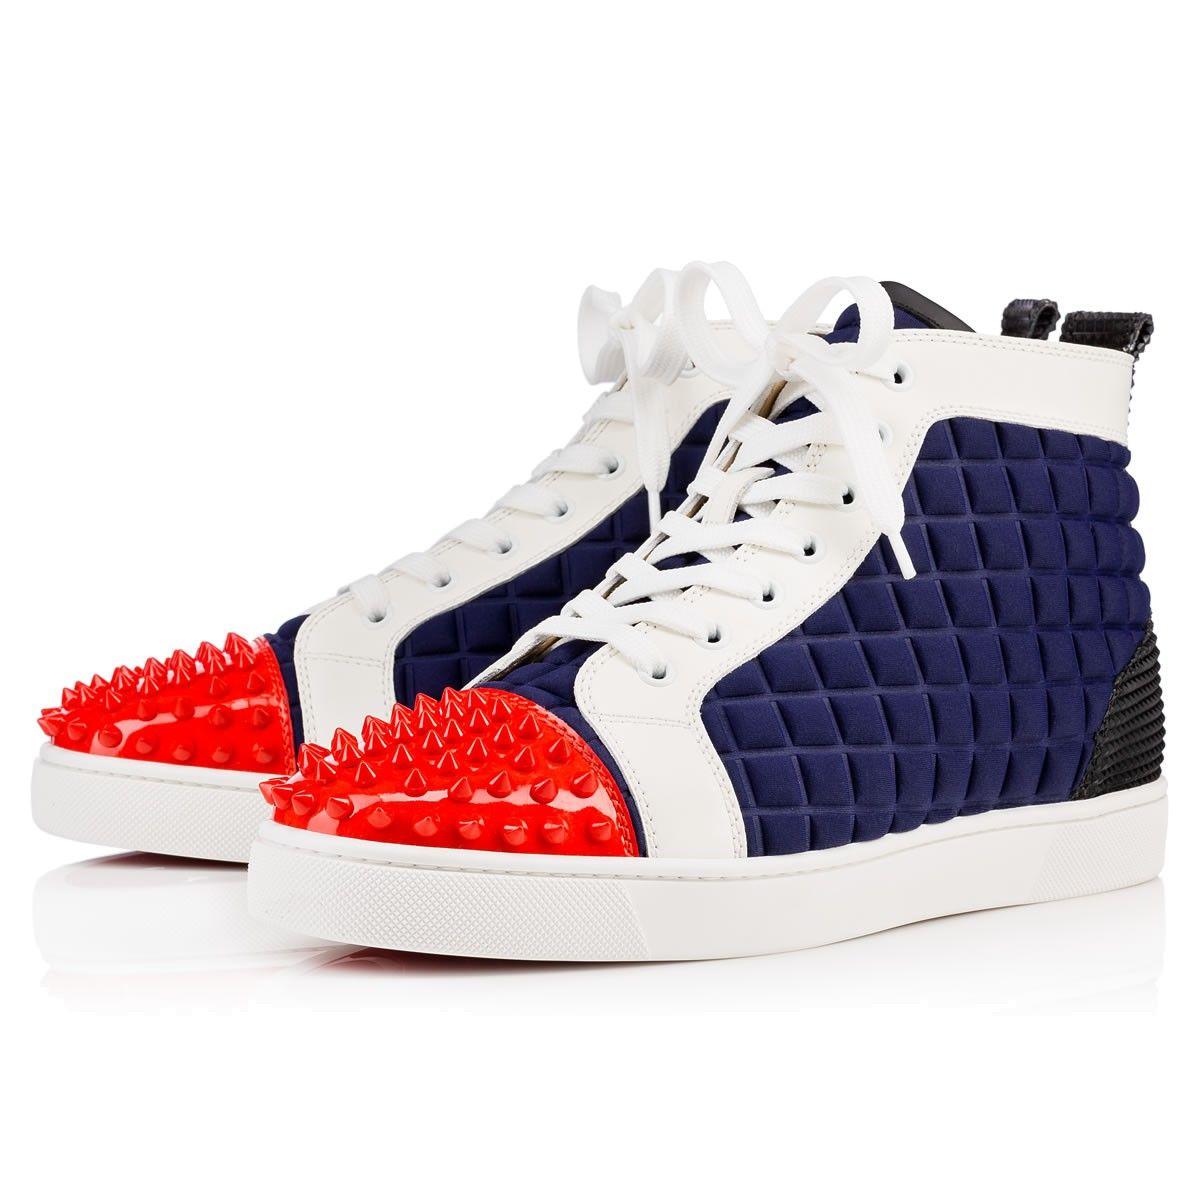 CHRISTIAN LOUBOUTIN Lou Spikes Men\u0027S Flat Version Multi Neoprene. # christianlouboutin #shoes #